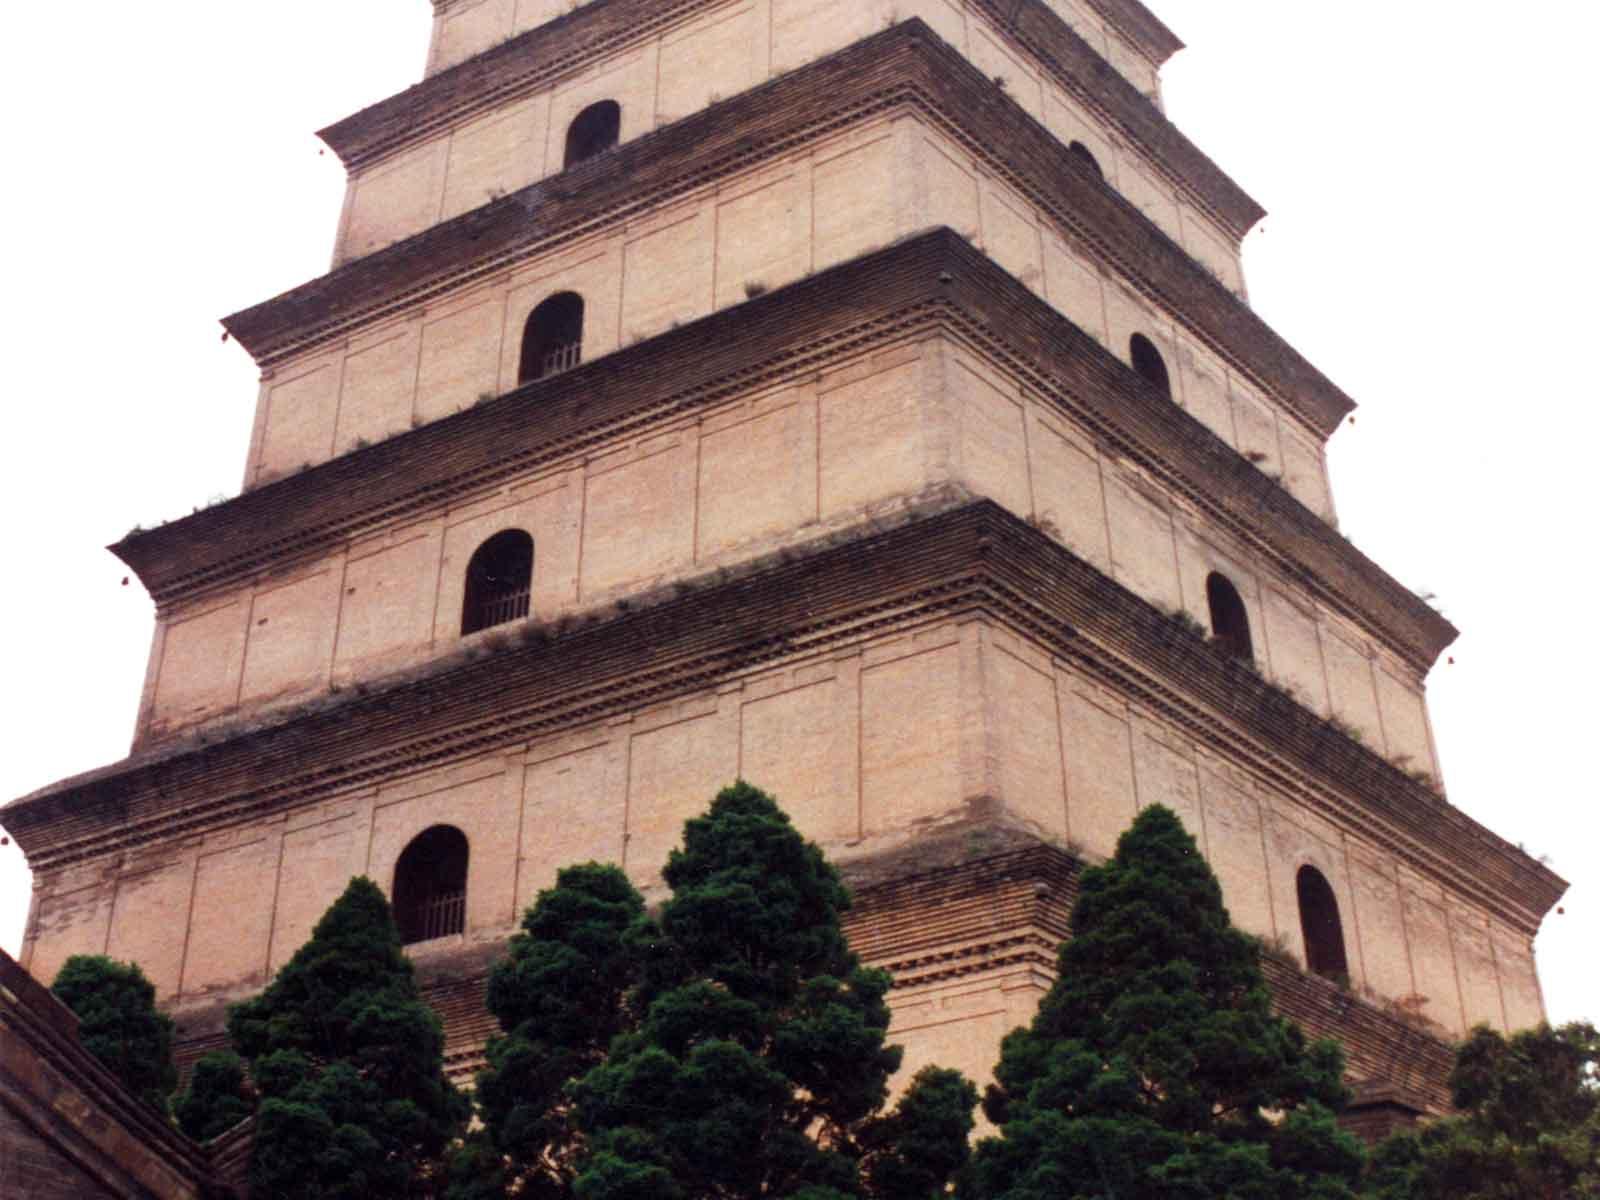 Ancient Silk Road - Buddhist Monks - Xian China - Steven Andrew Martin PhD - Study Abroad Journal